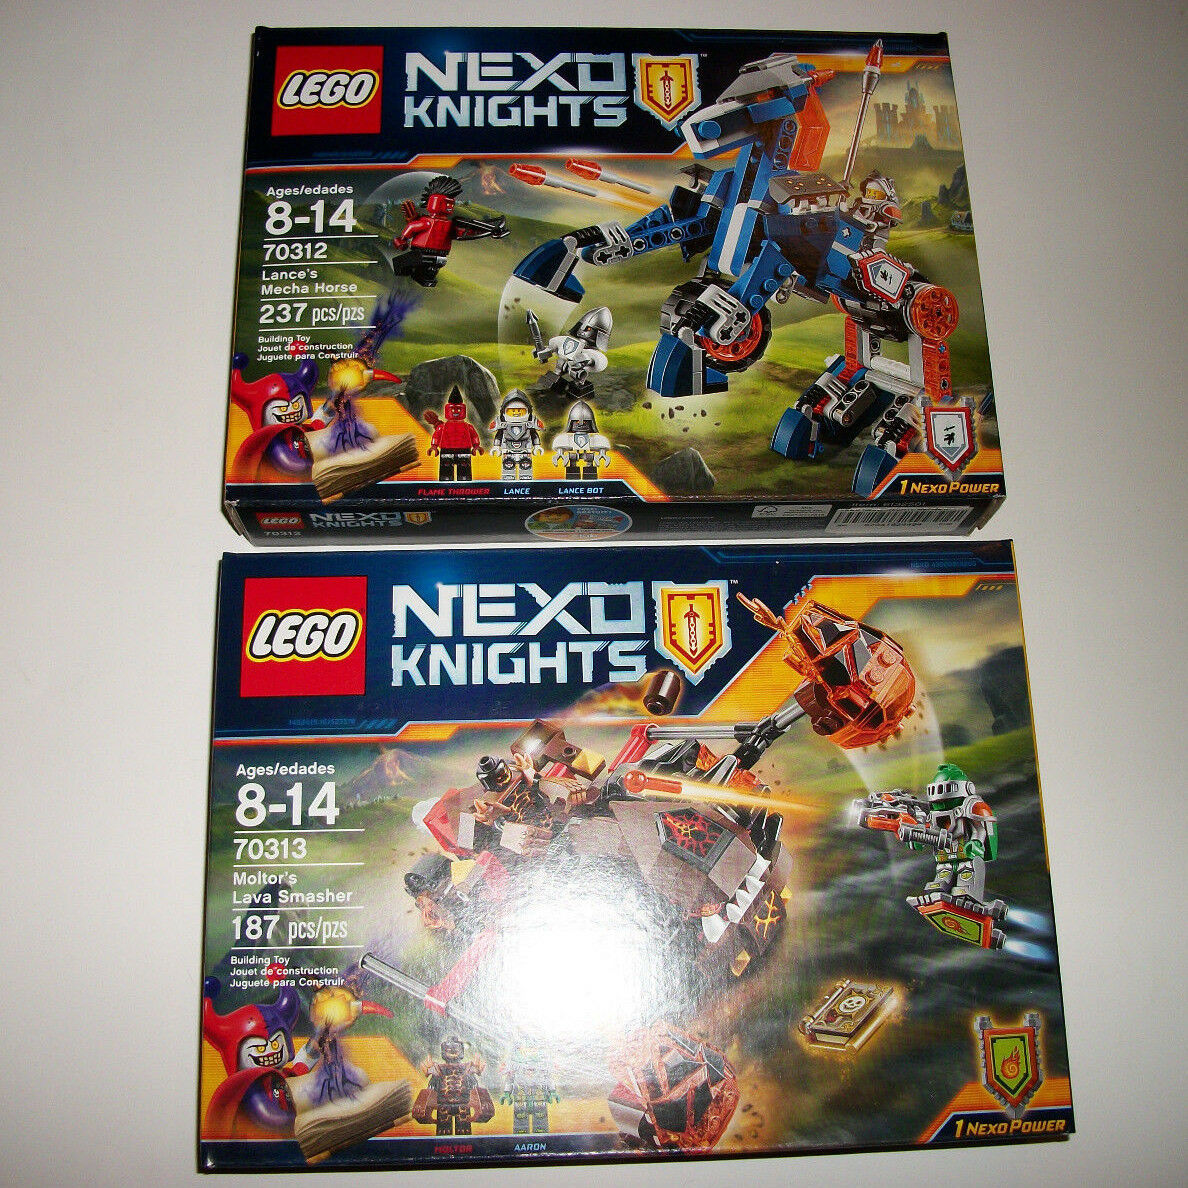 Lego Sealed Set Lot Nexo Knights Knights Knights 2 Sets 70313 70312 Mecha Horse Lava Smasher a82864